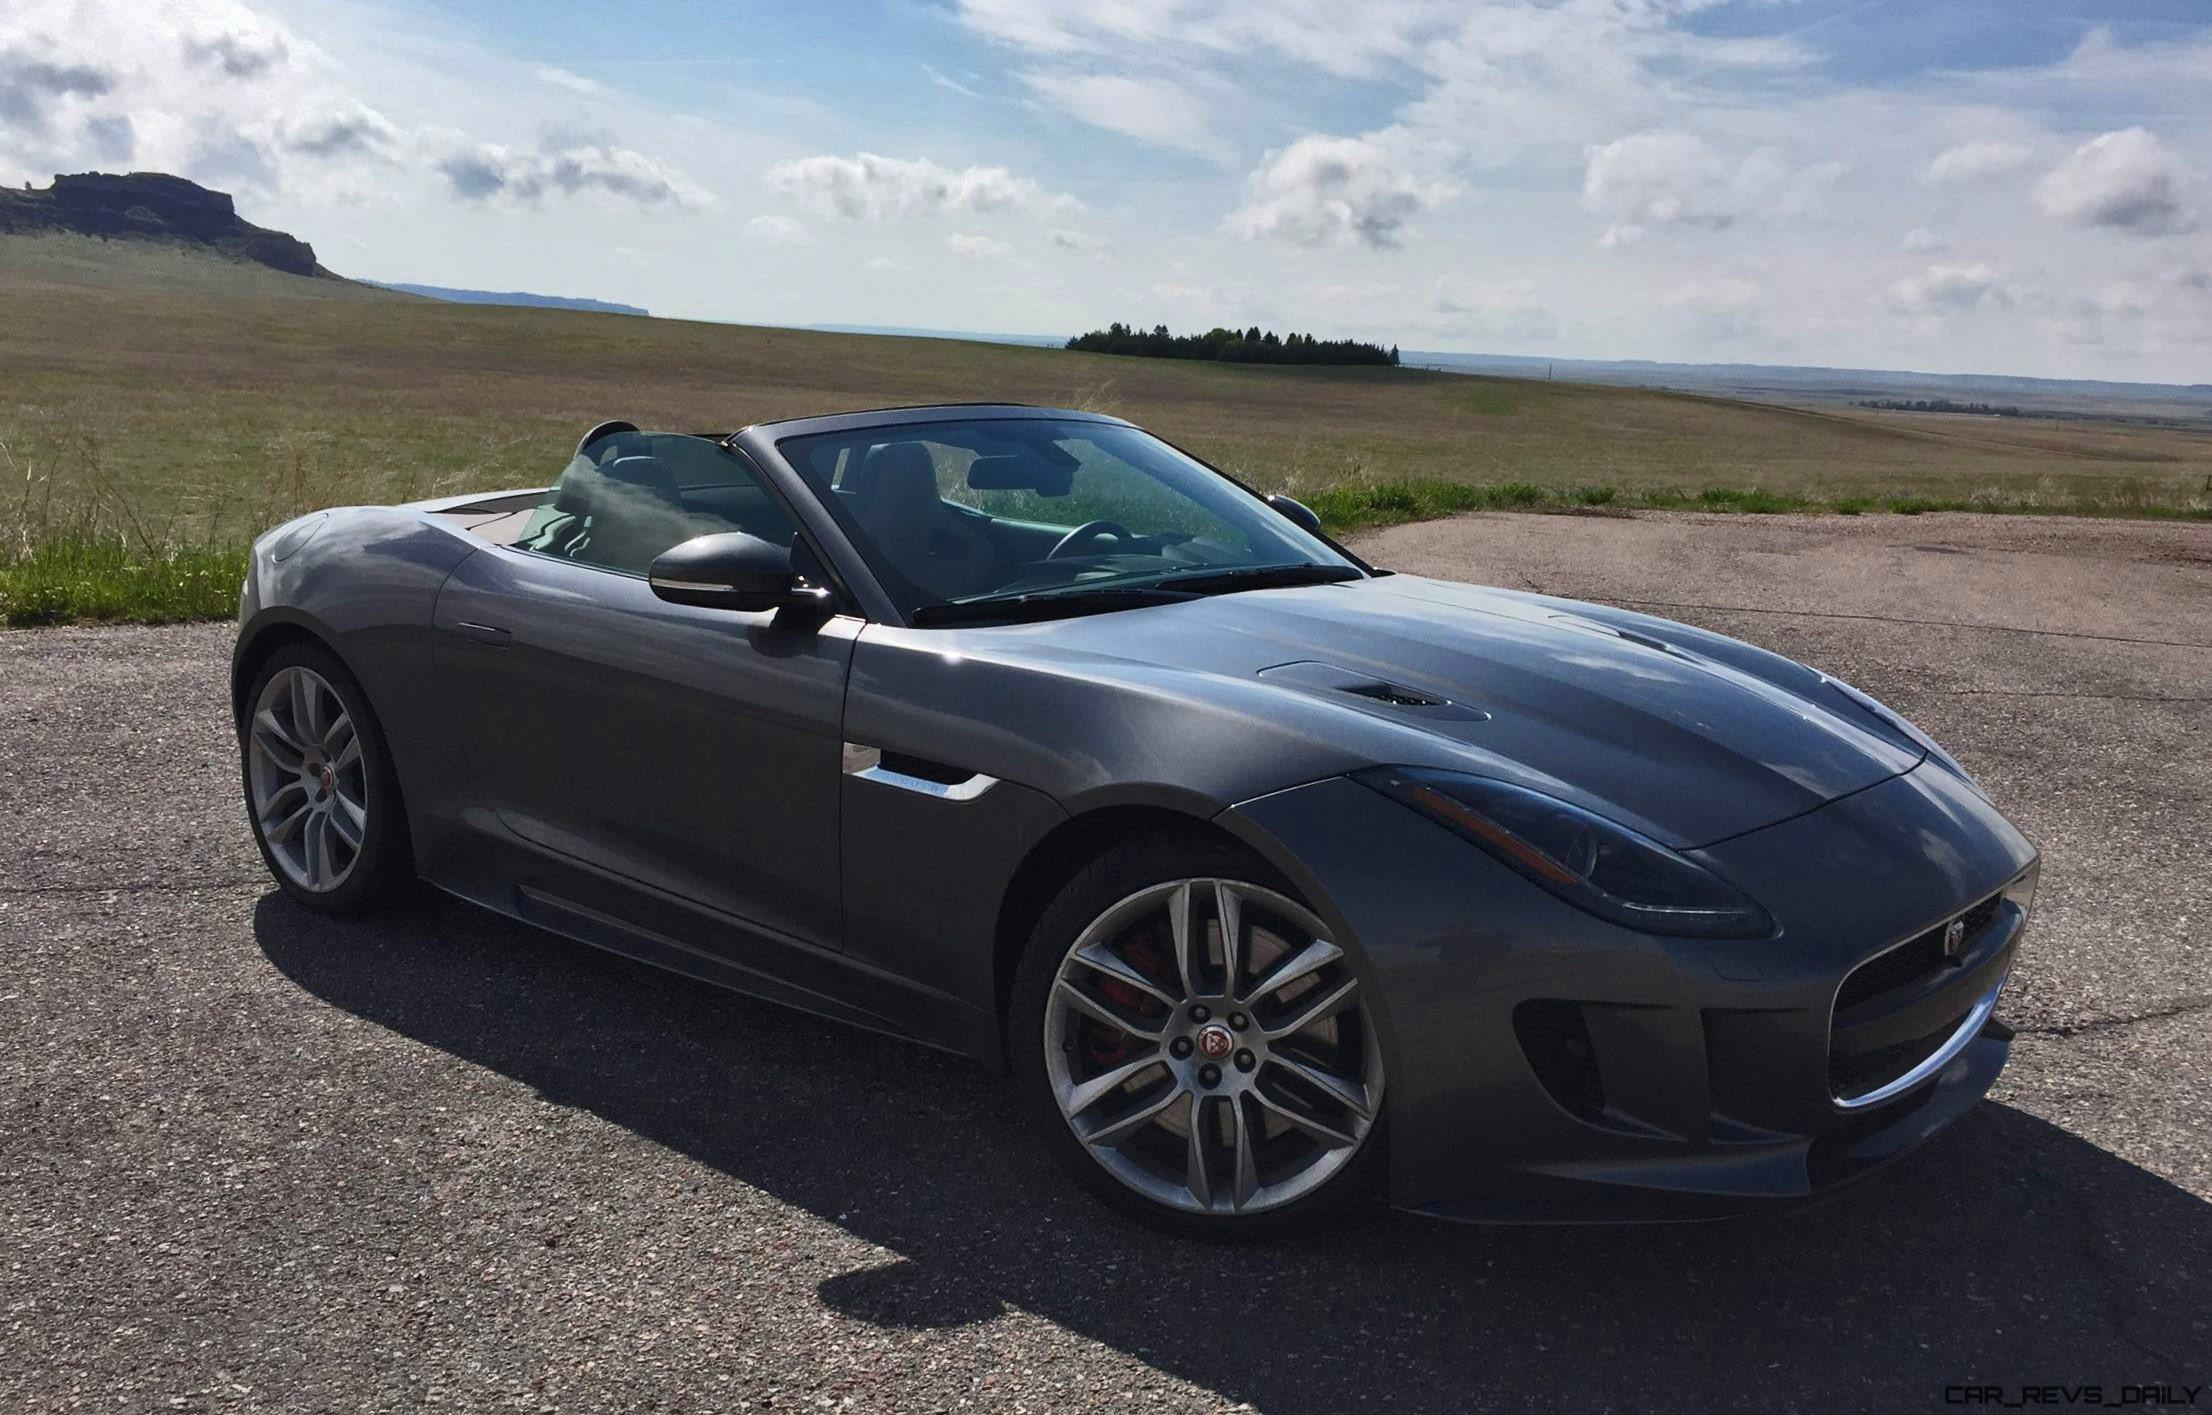 for classic xjs import fort sale car cars near lauderdale convertible jaguar